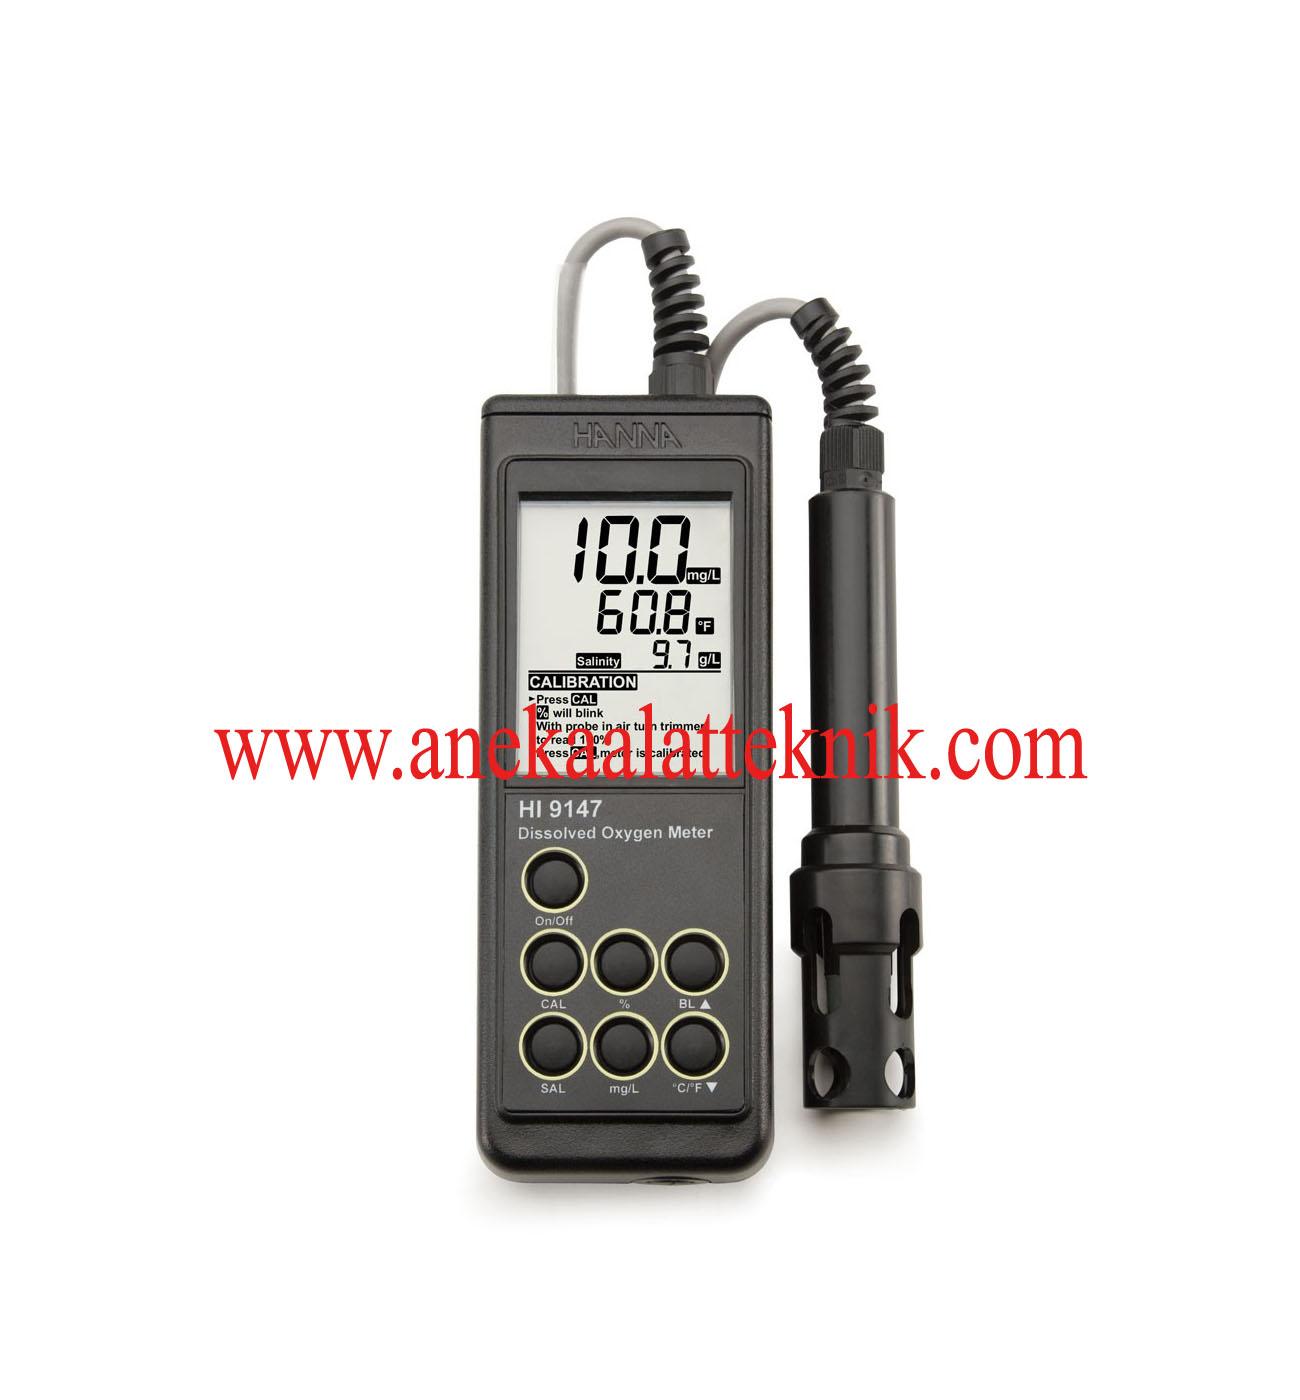 Jual Portable Galvanic Dissolved Oxygen Meter HANNA HI 9147